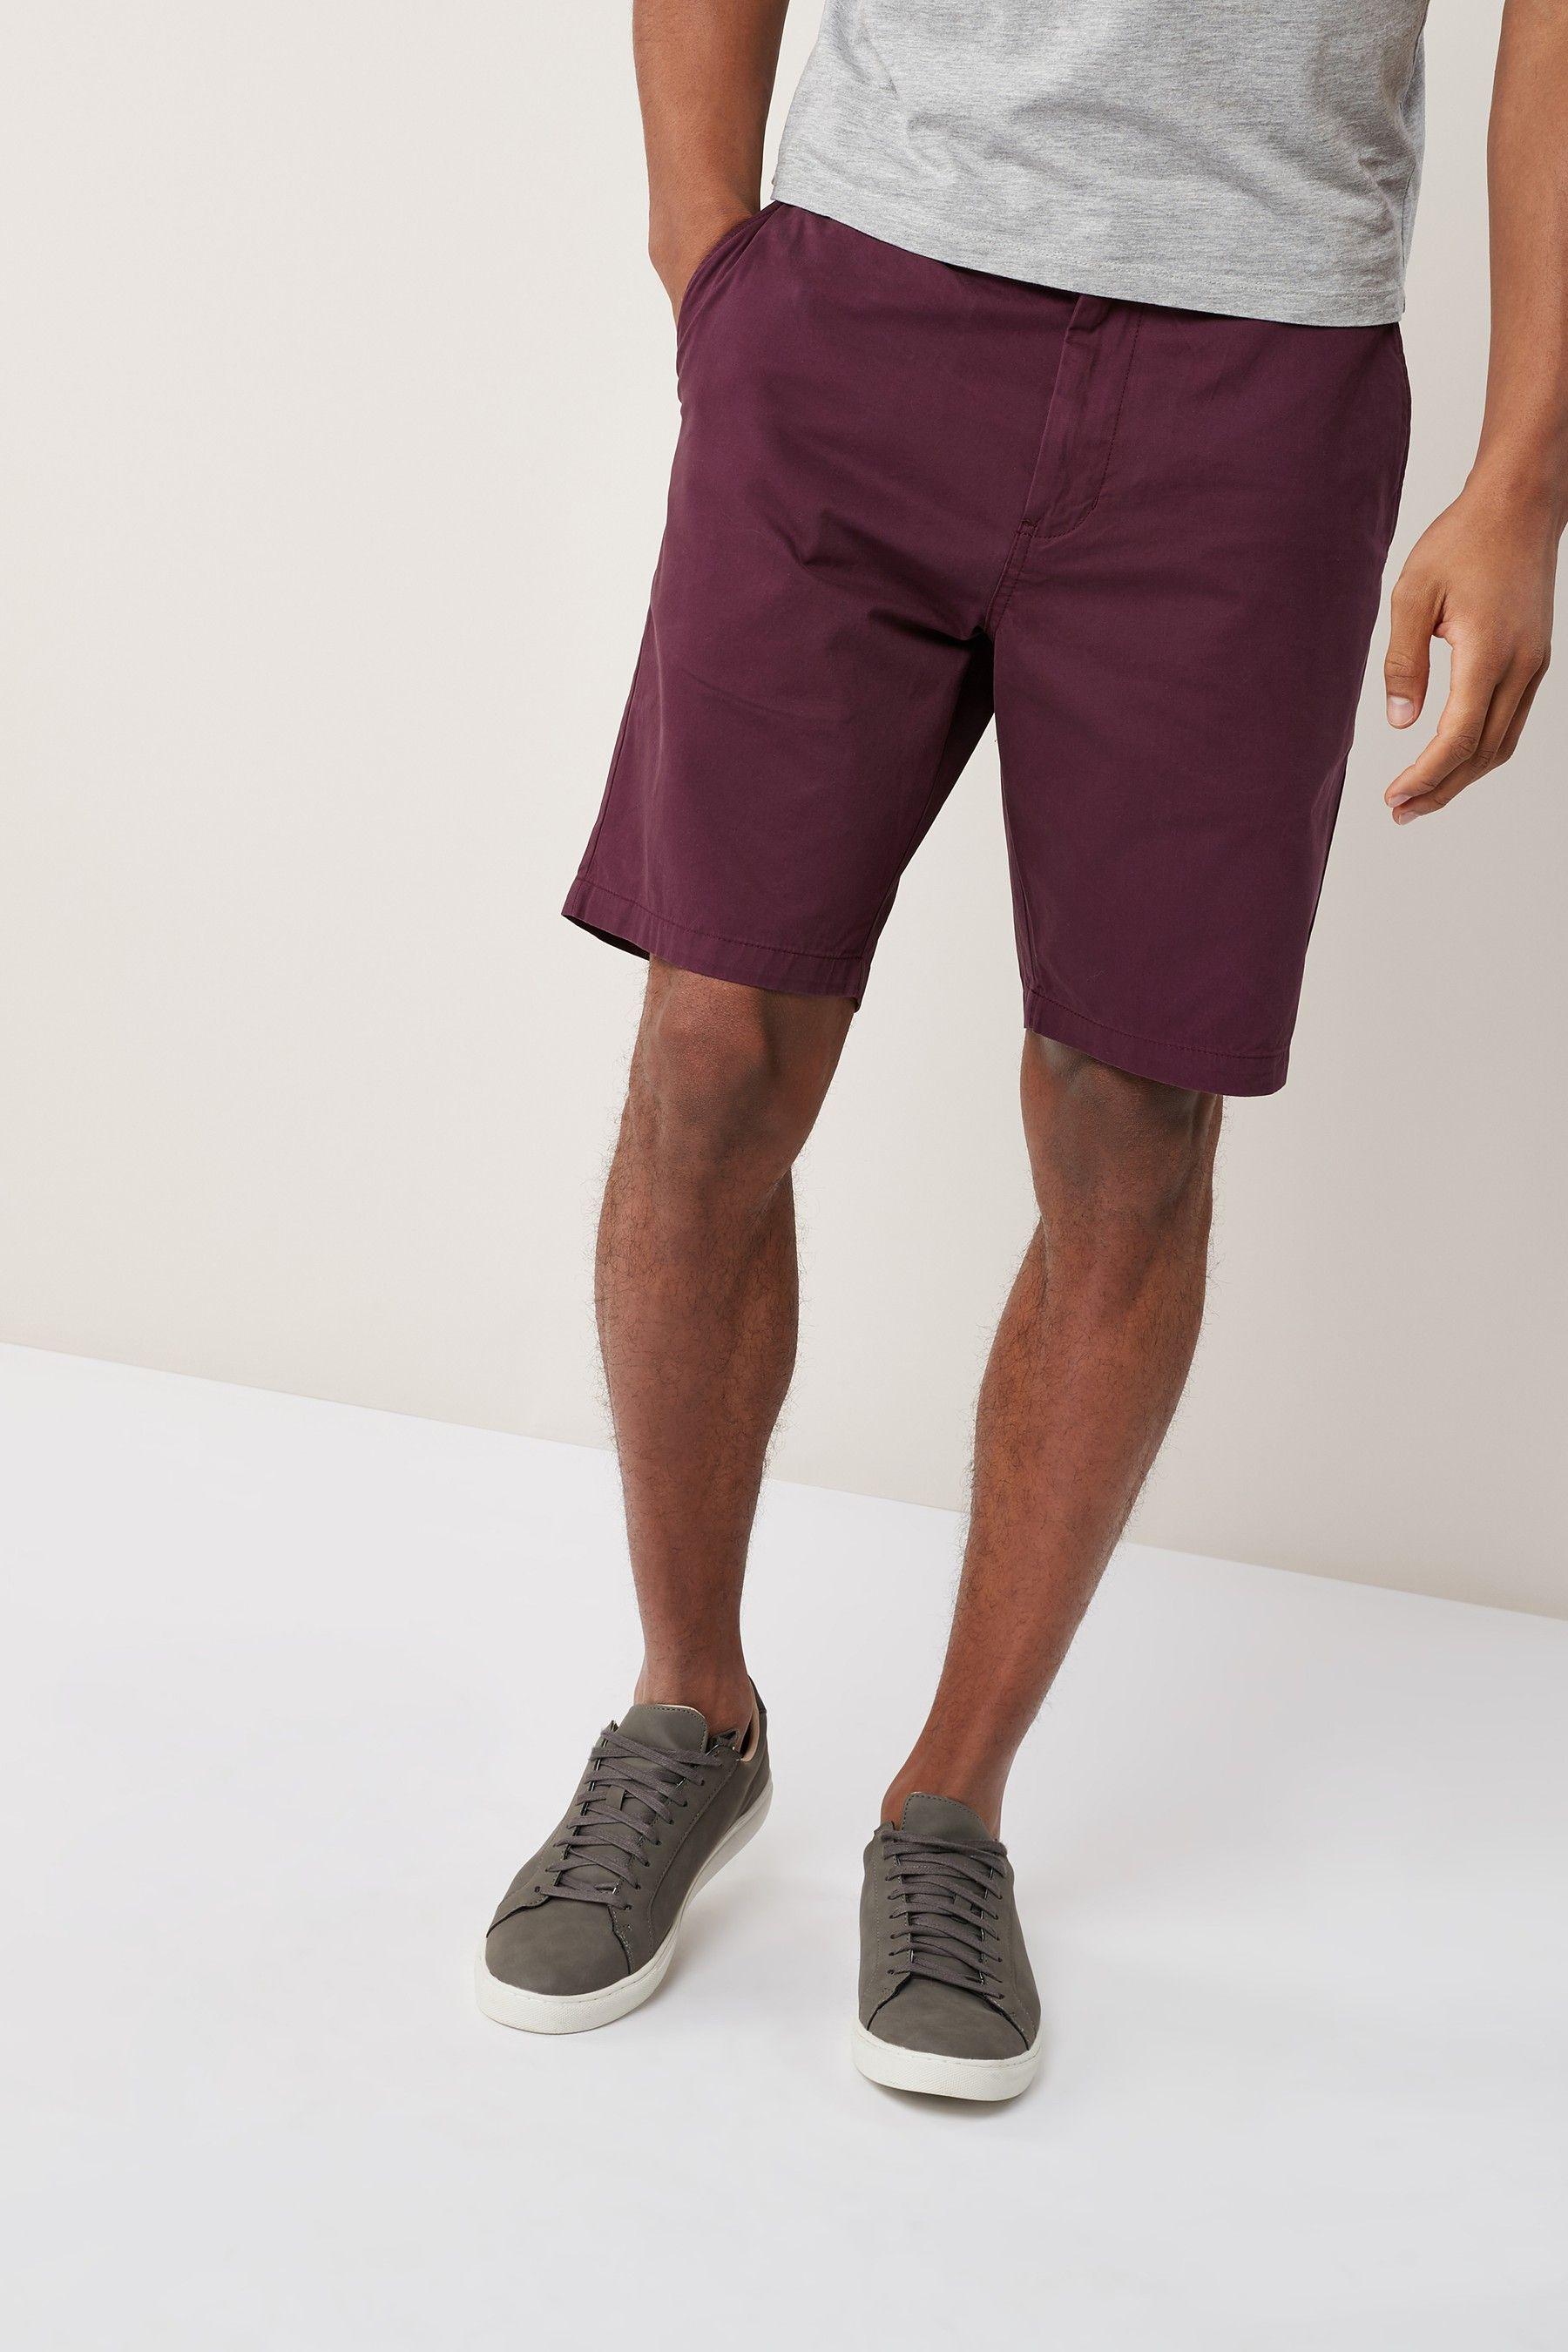 03e7b06ce0 Mens Next Burgundy Chino Shorts - Red | Men's Burgundy Shorts in ...